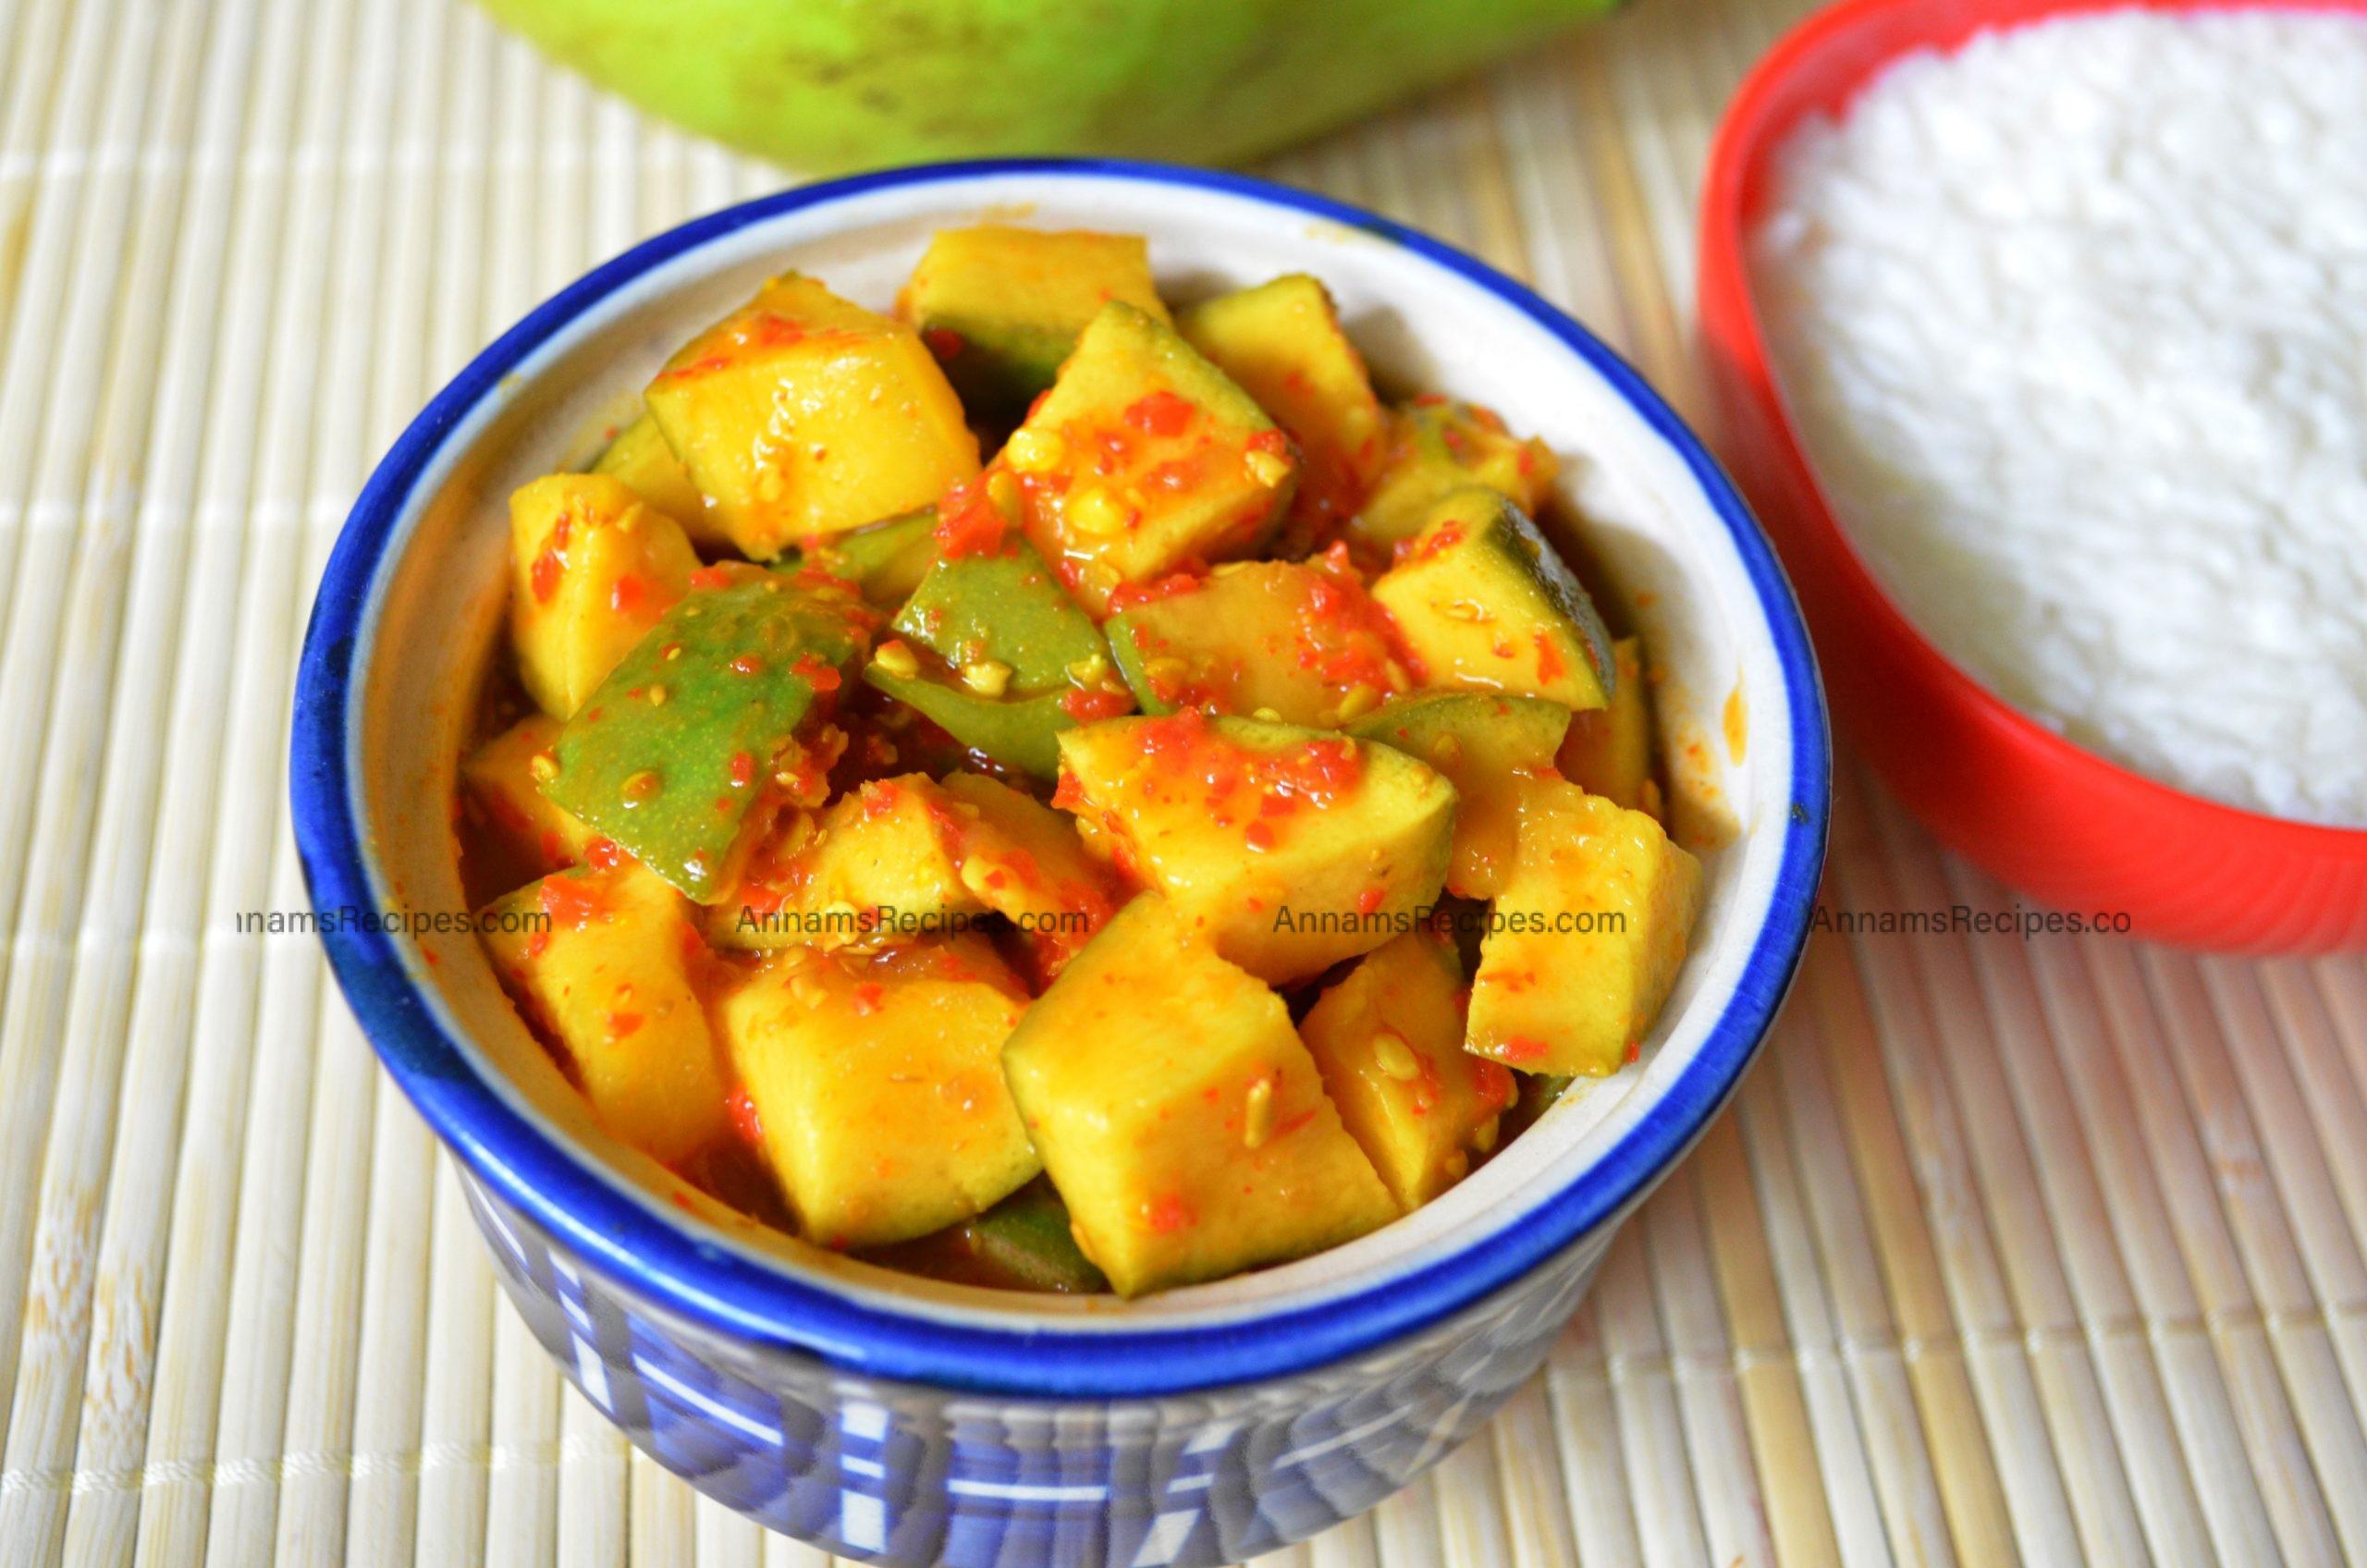 vendhaya mangai recipe Chettinad Vendhaya Mangai